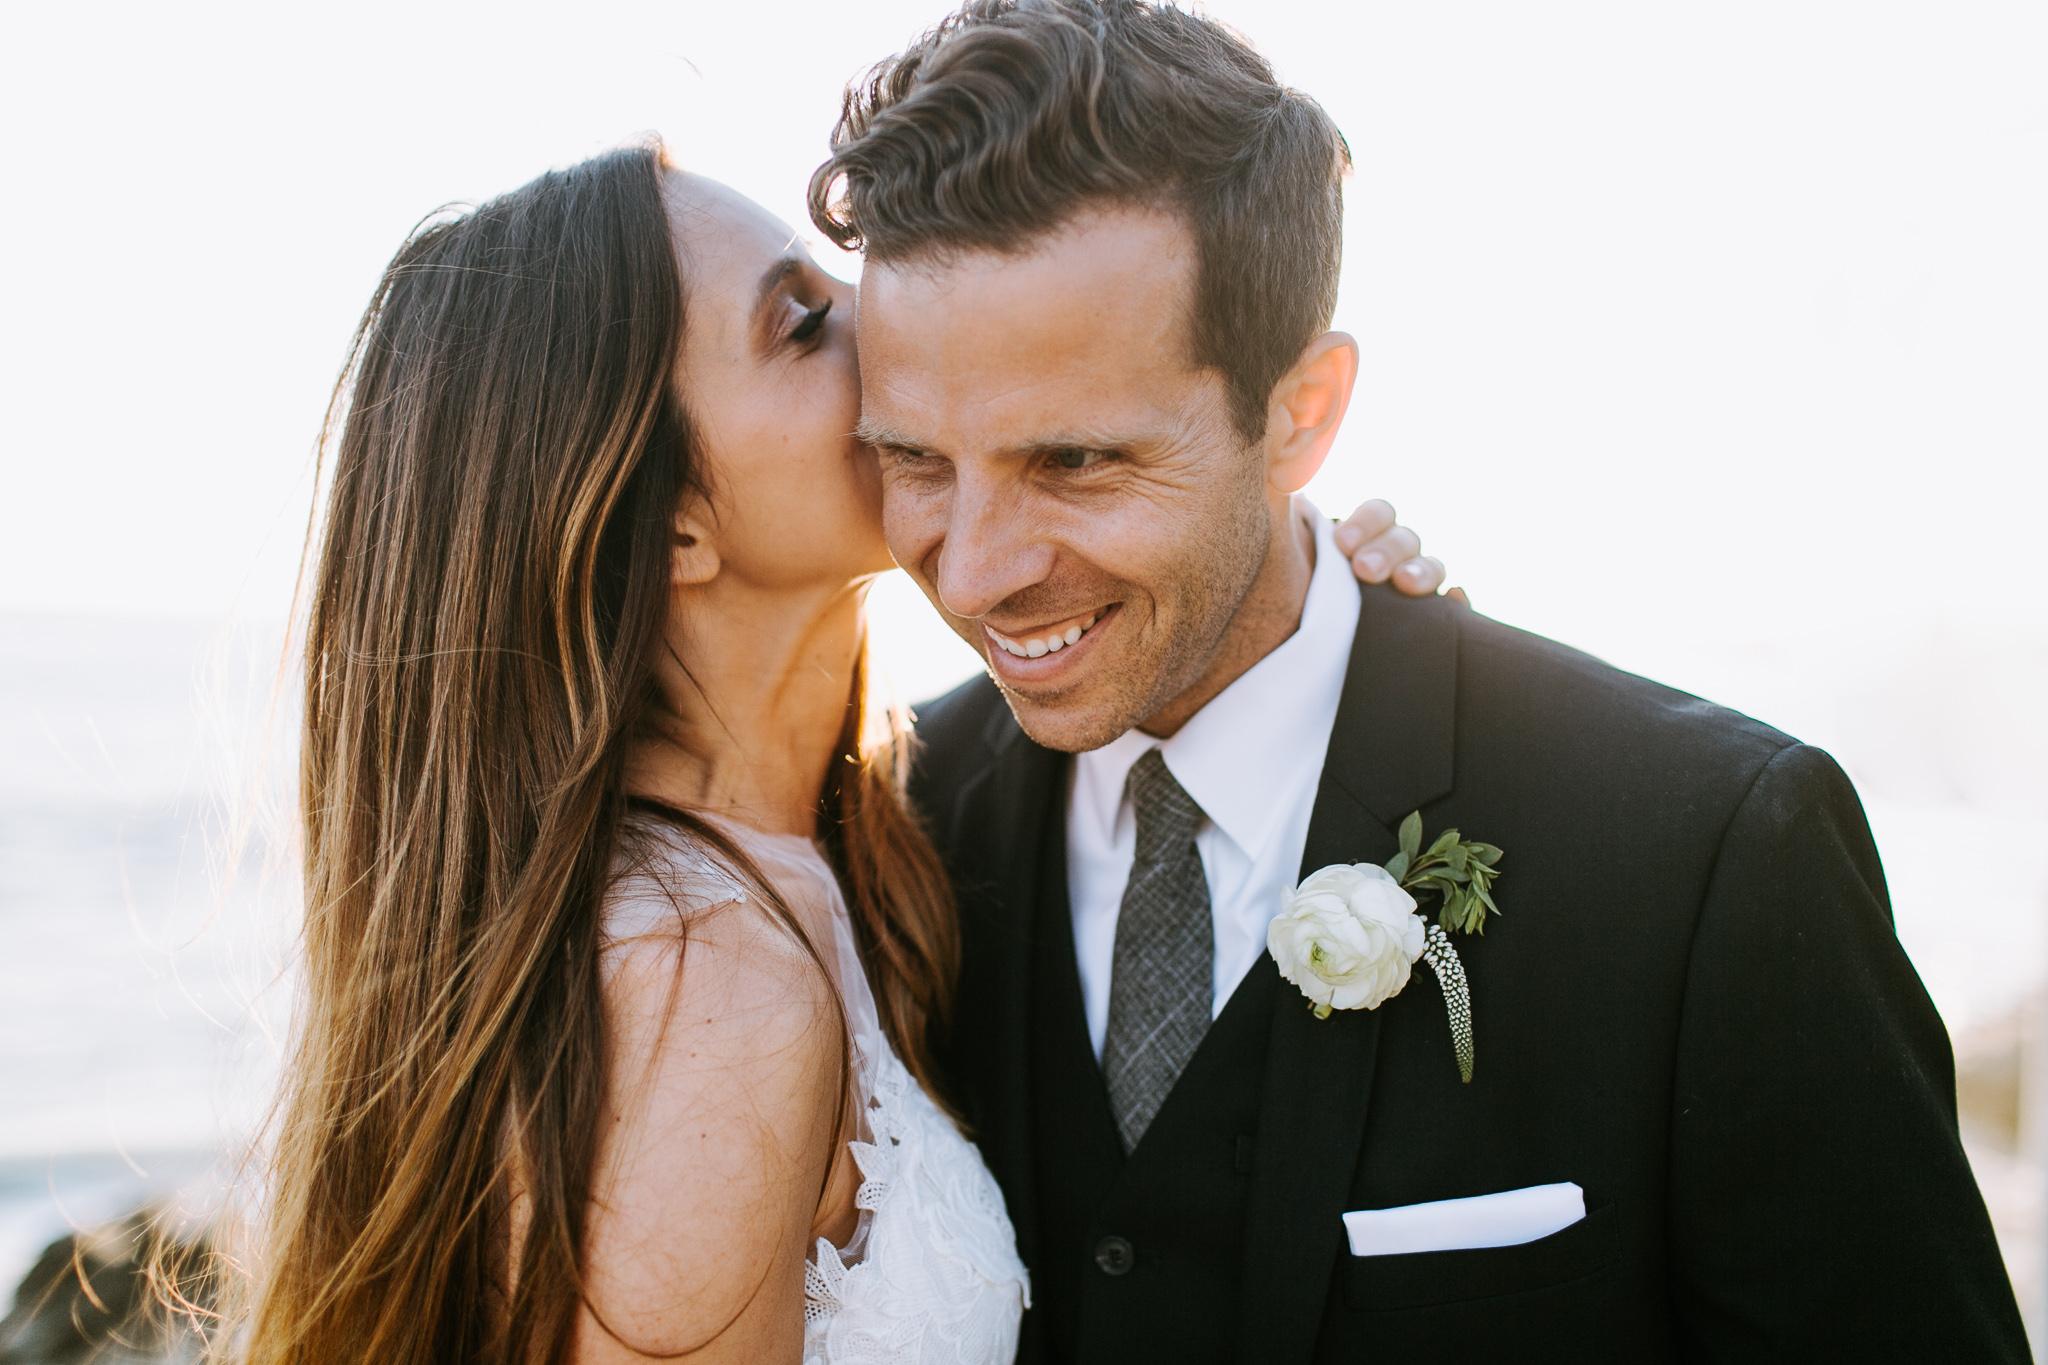 LagunaBeach-WeddingPhotographer-52.jpg